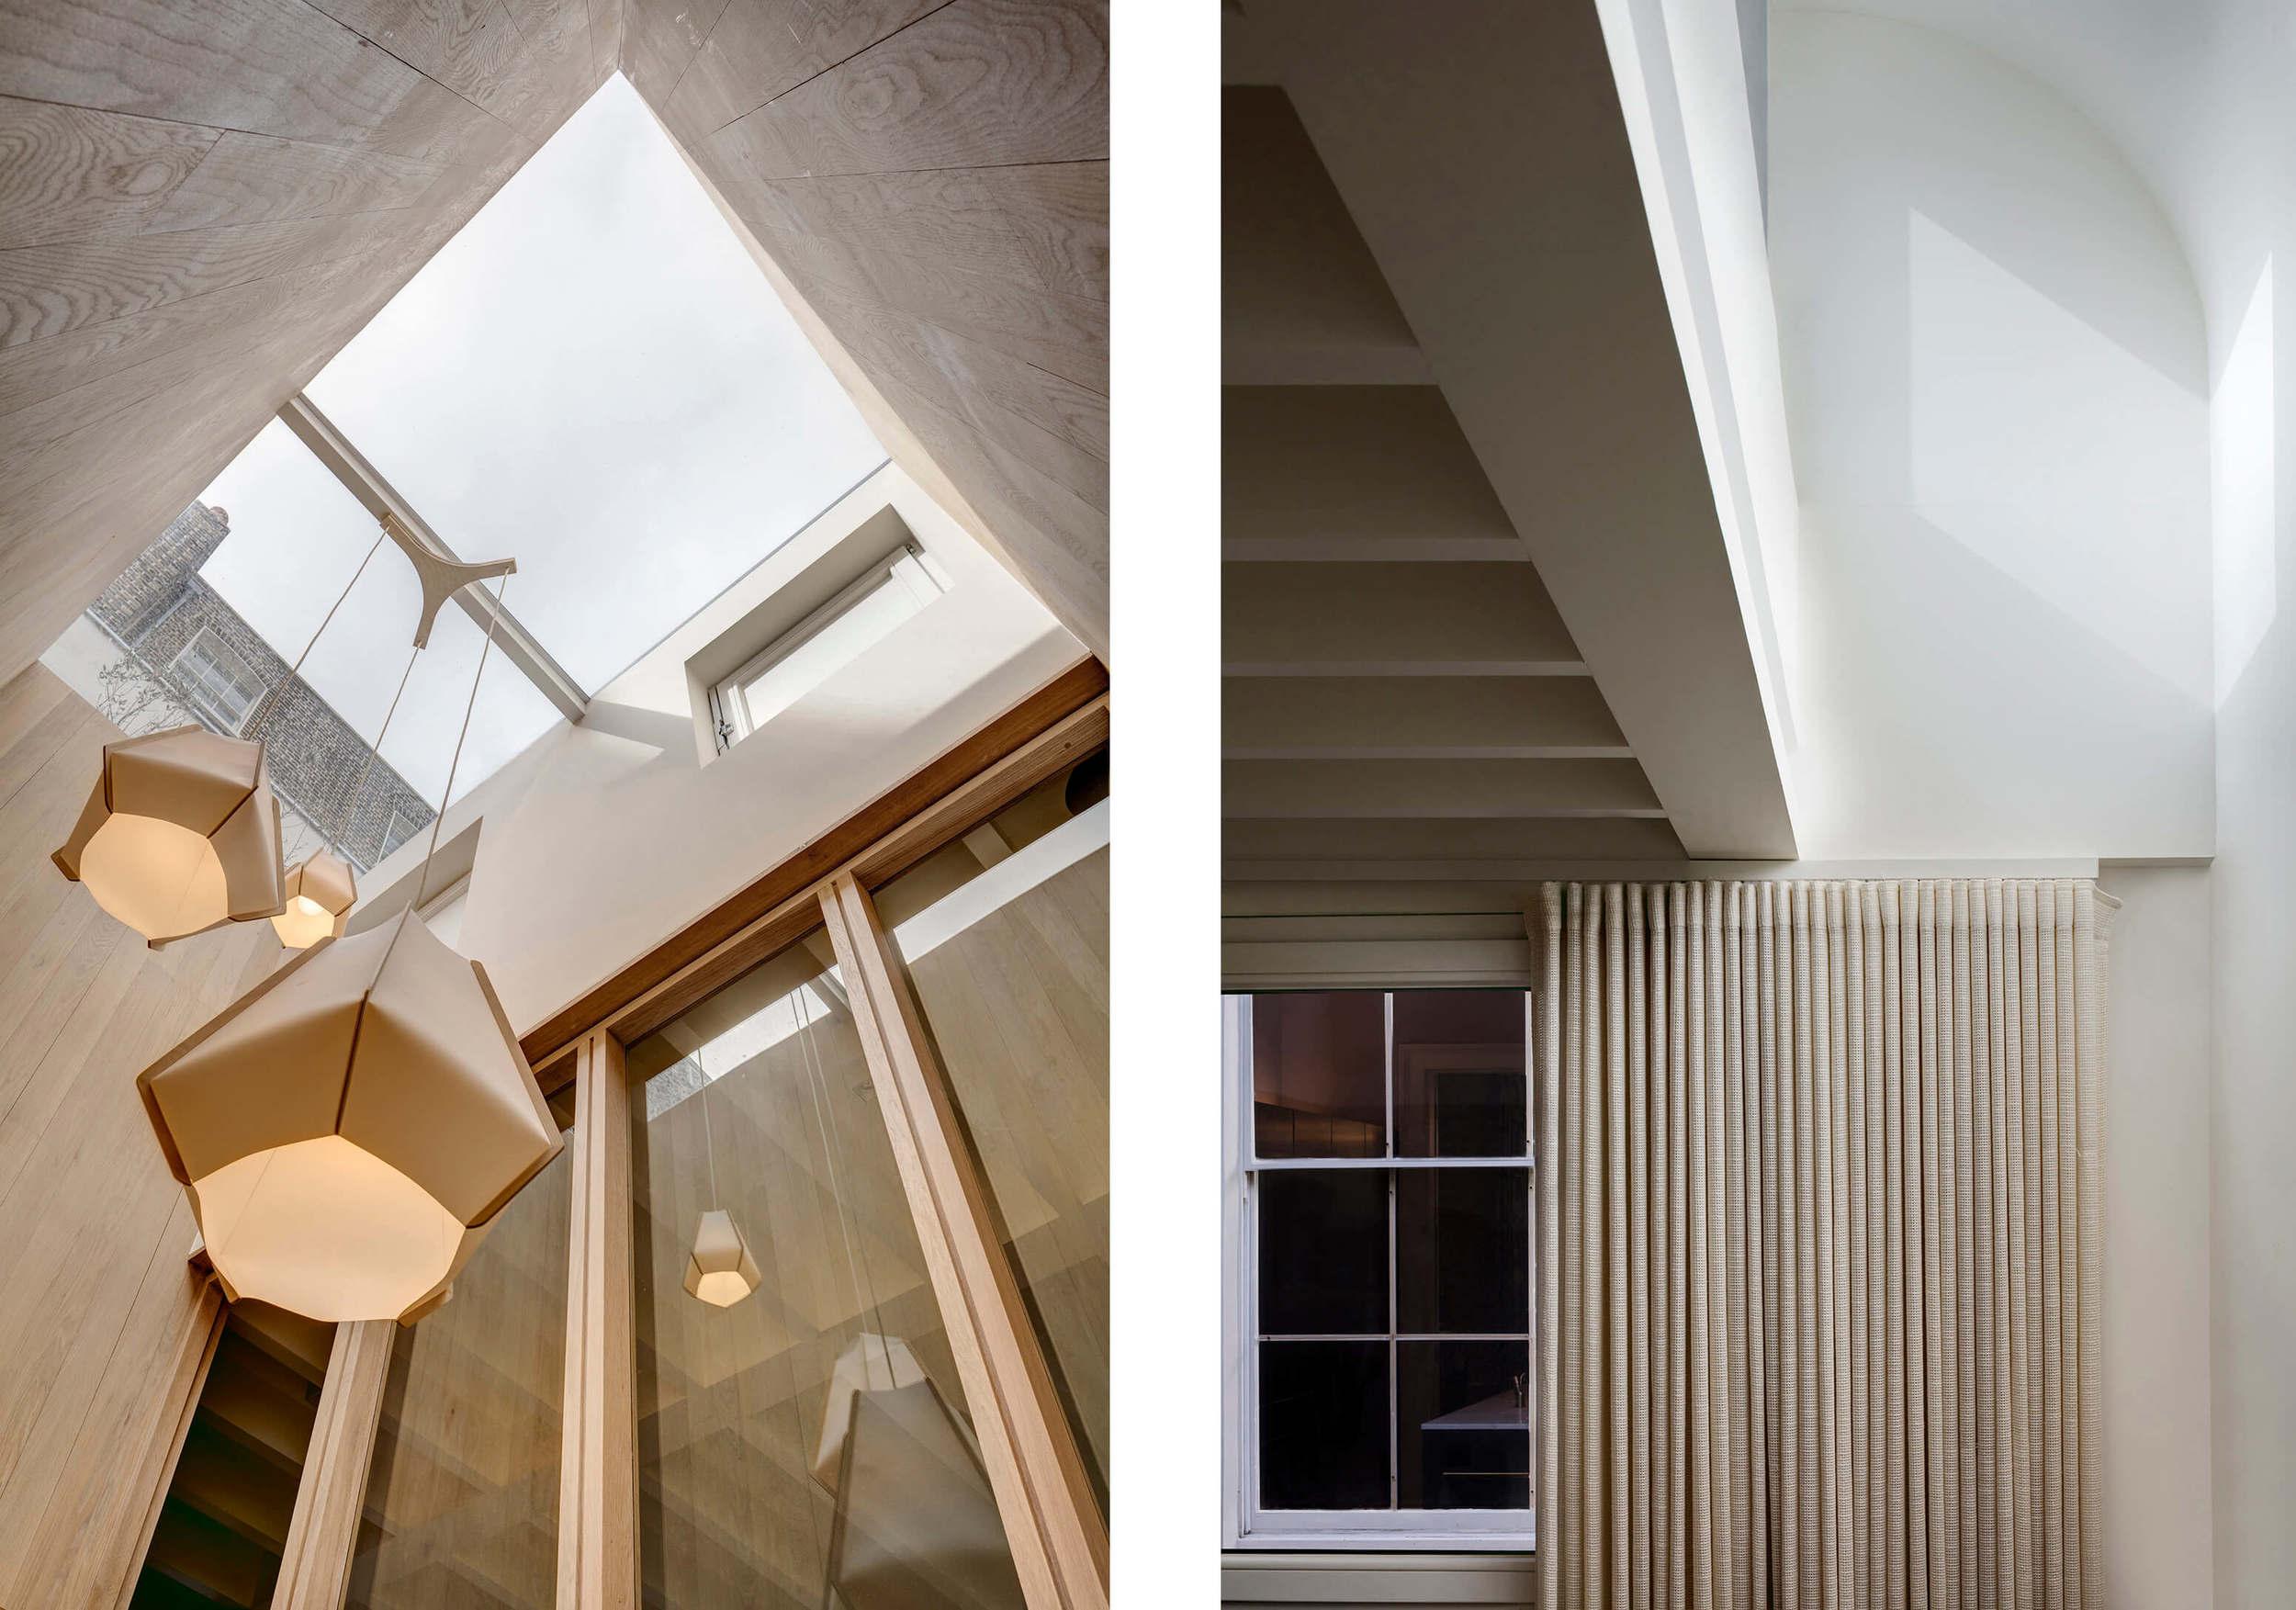 enerphit passivhaus prewett bizley architects stair lights.jpg